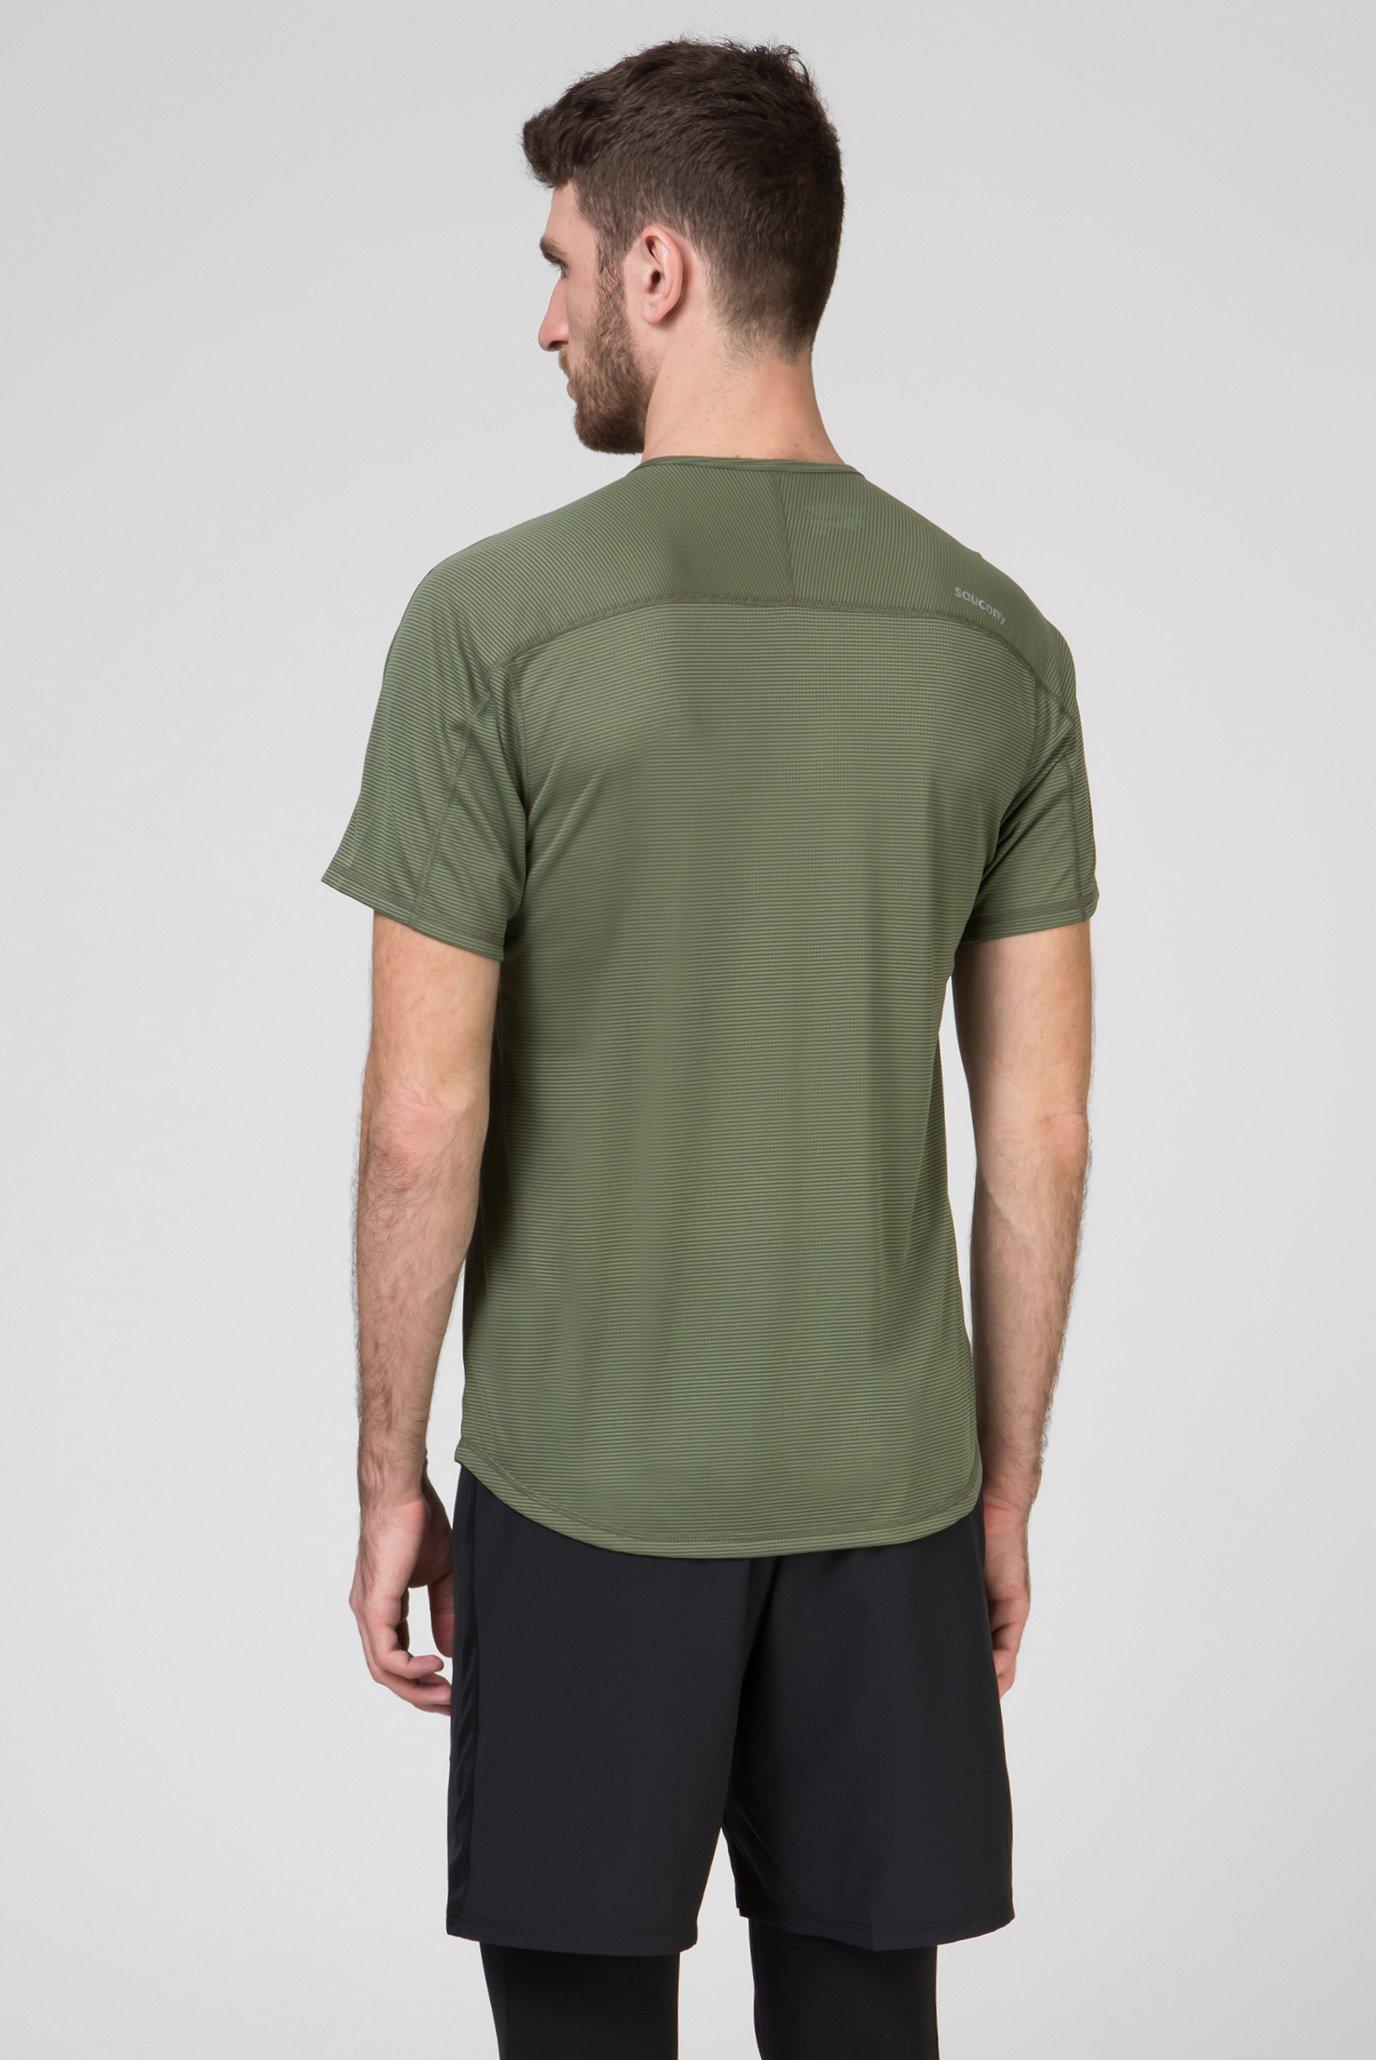 Мужская оливковая футболка HYDRALITE Saucony